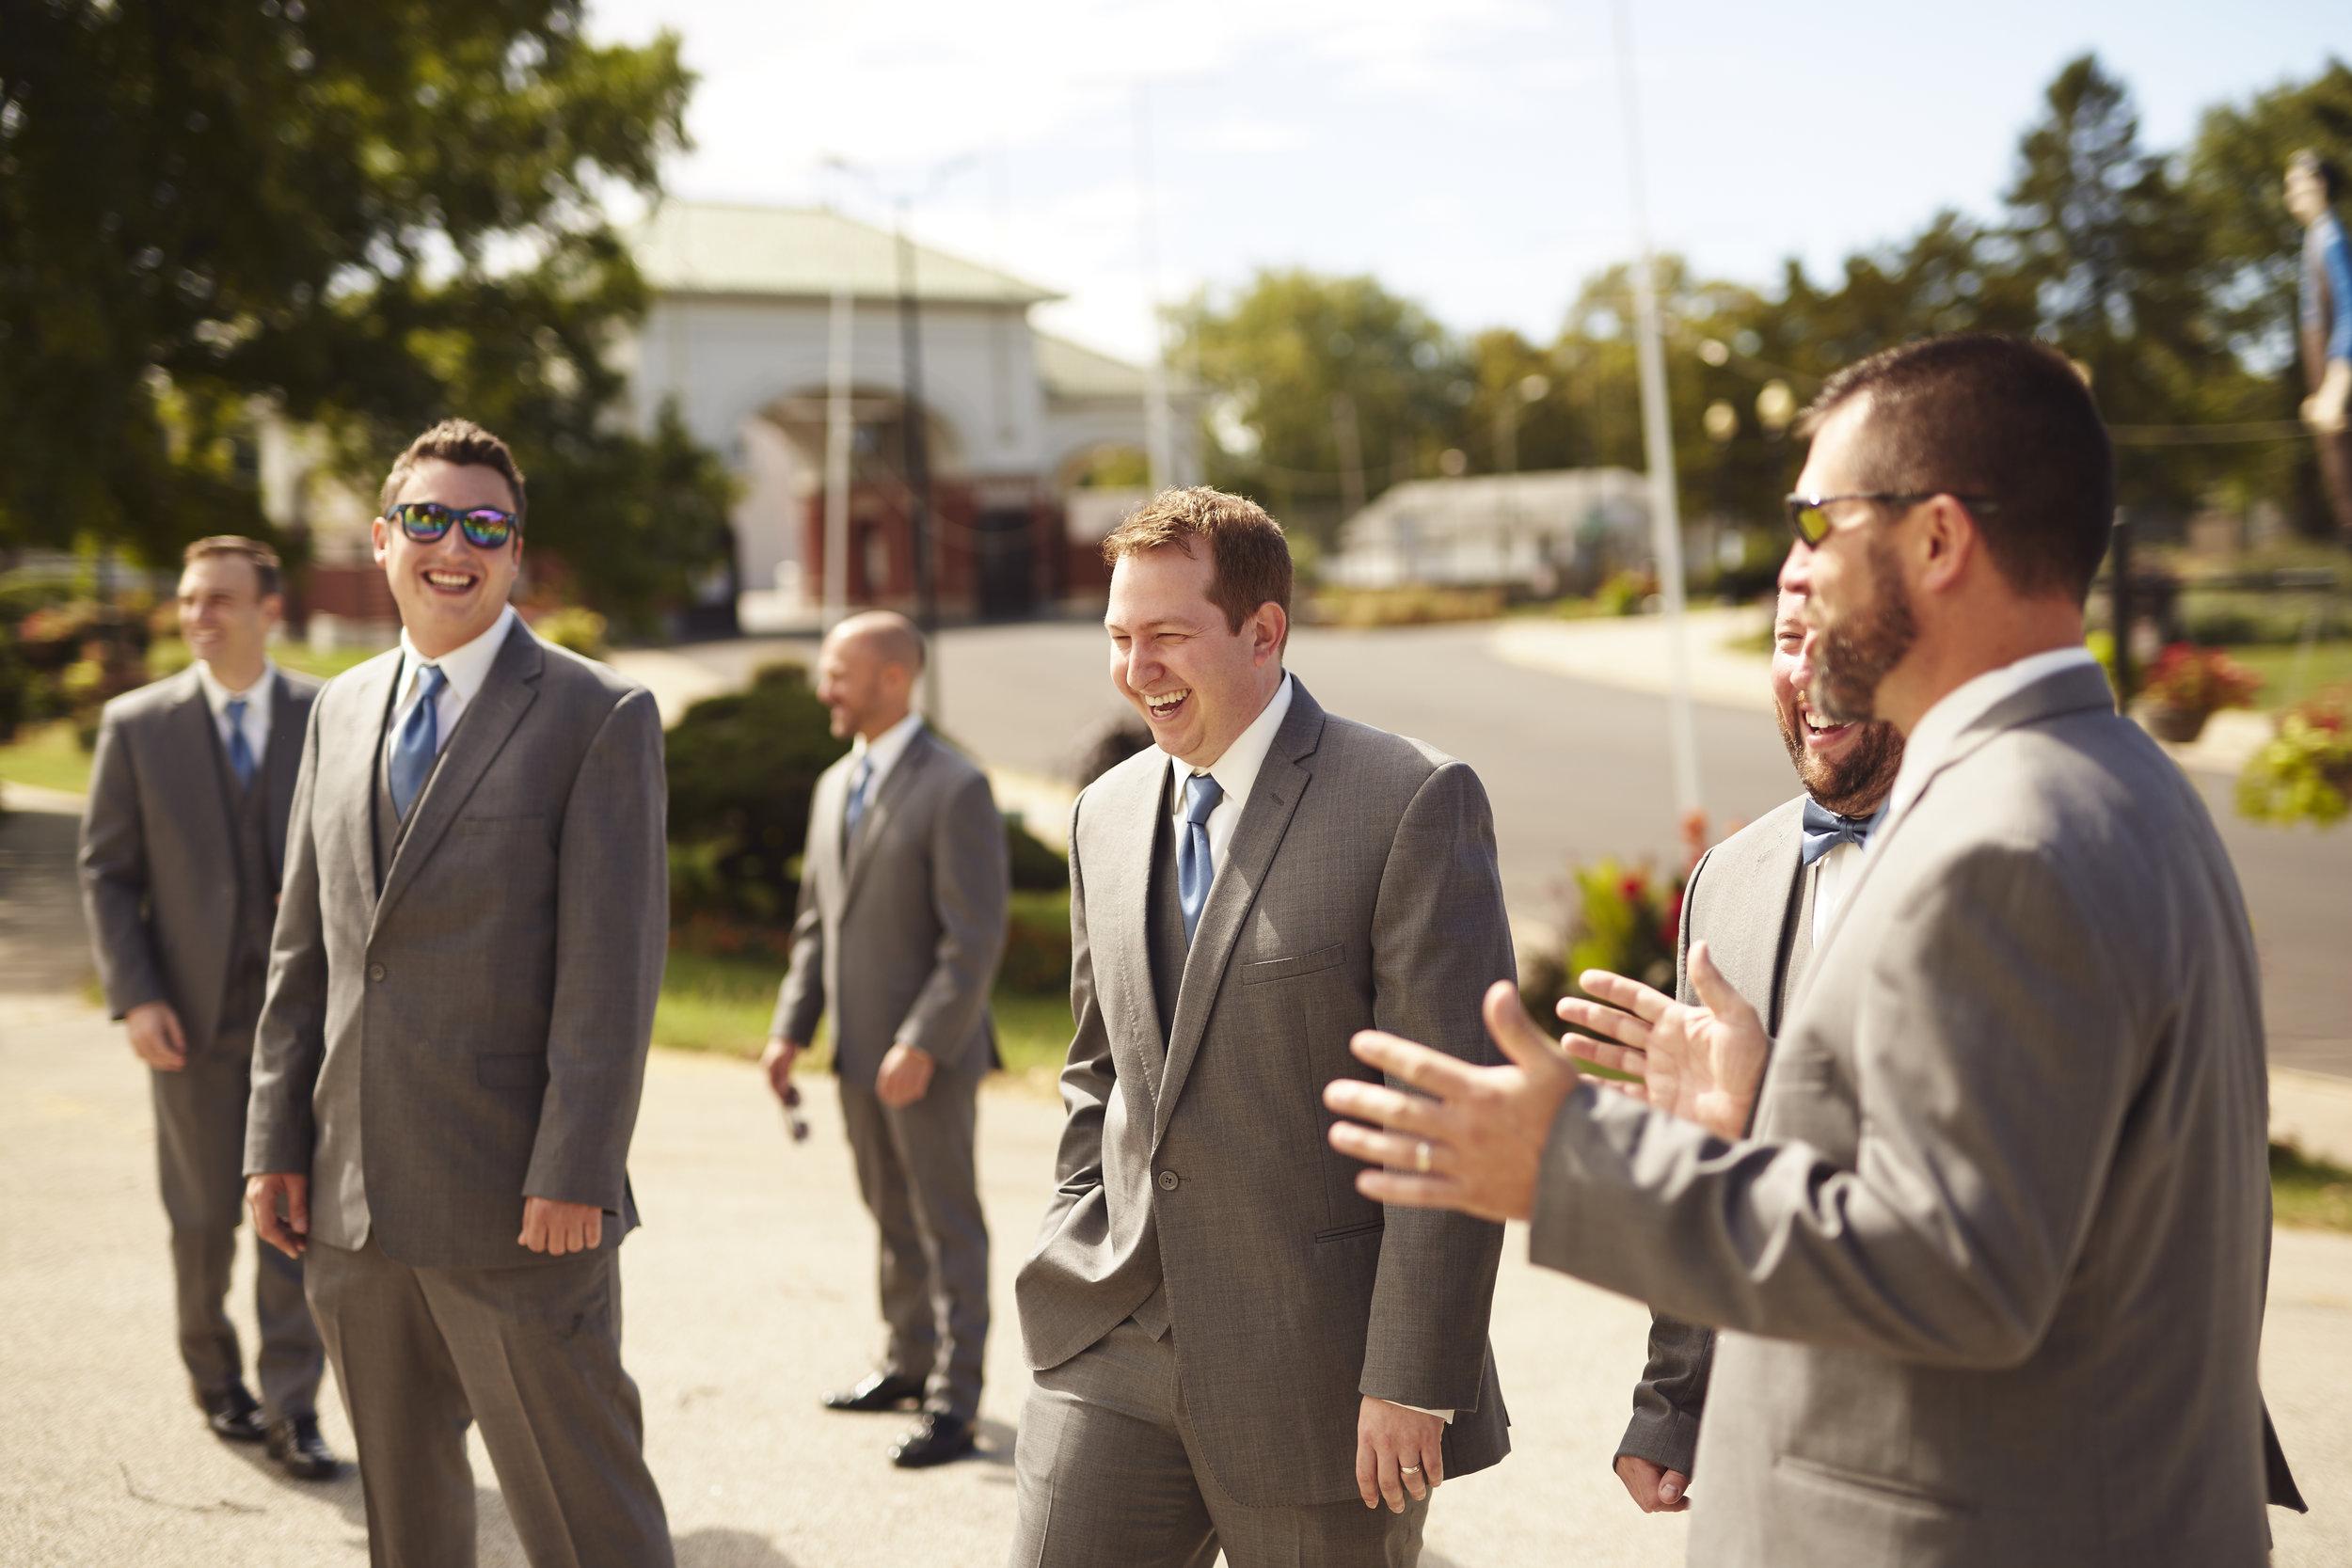 groomsmen photo at Springfield IL fairgrounds